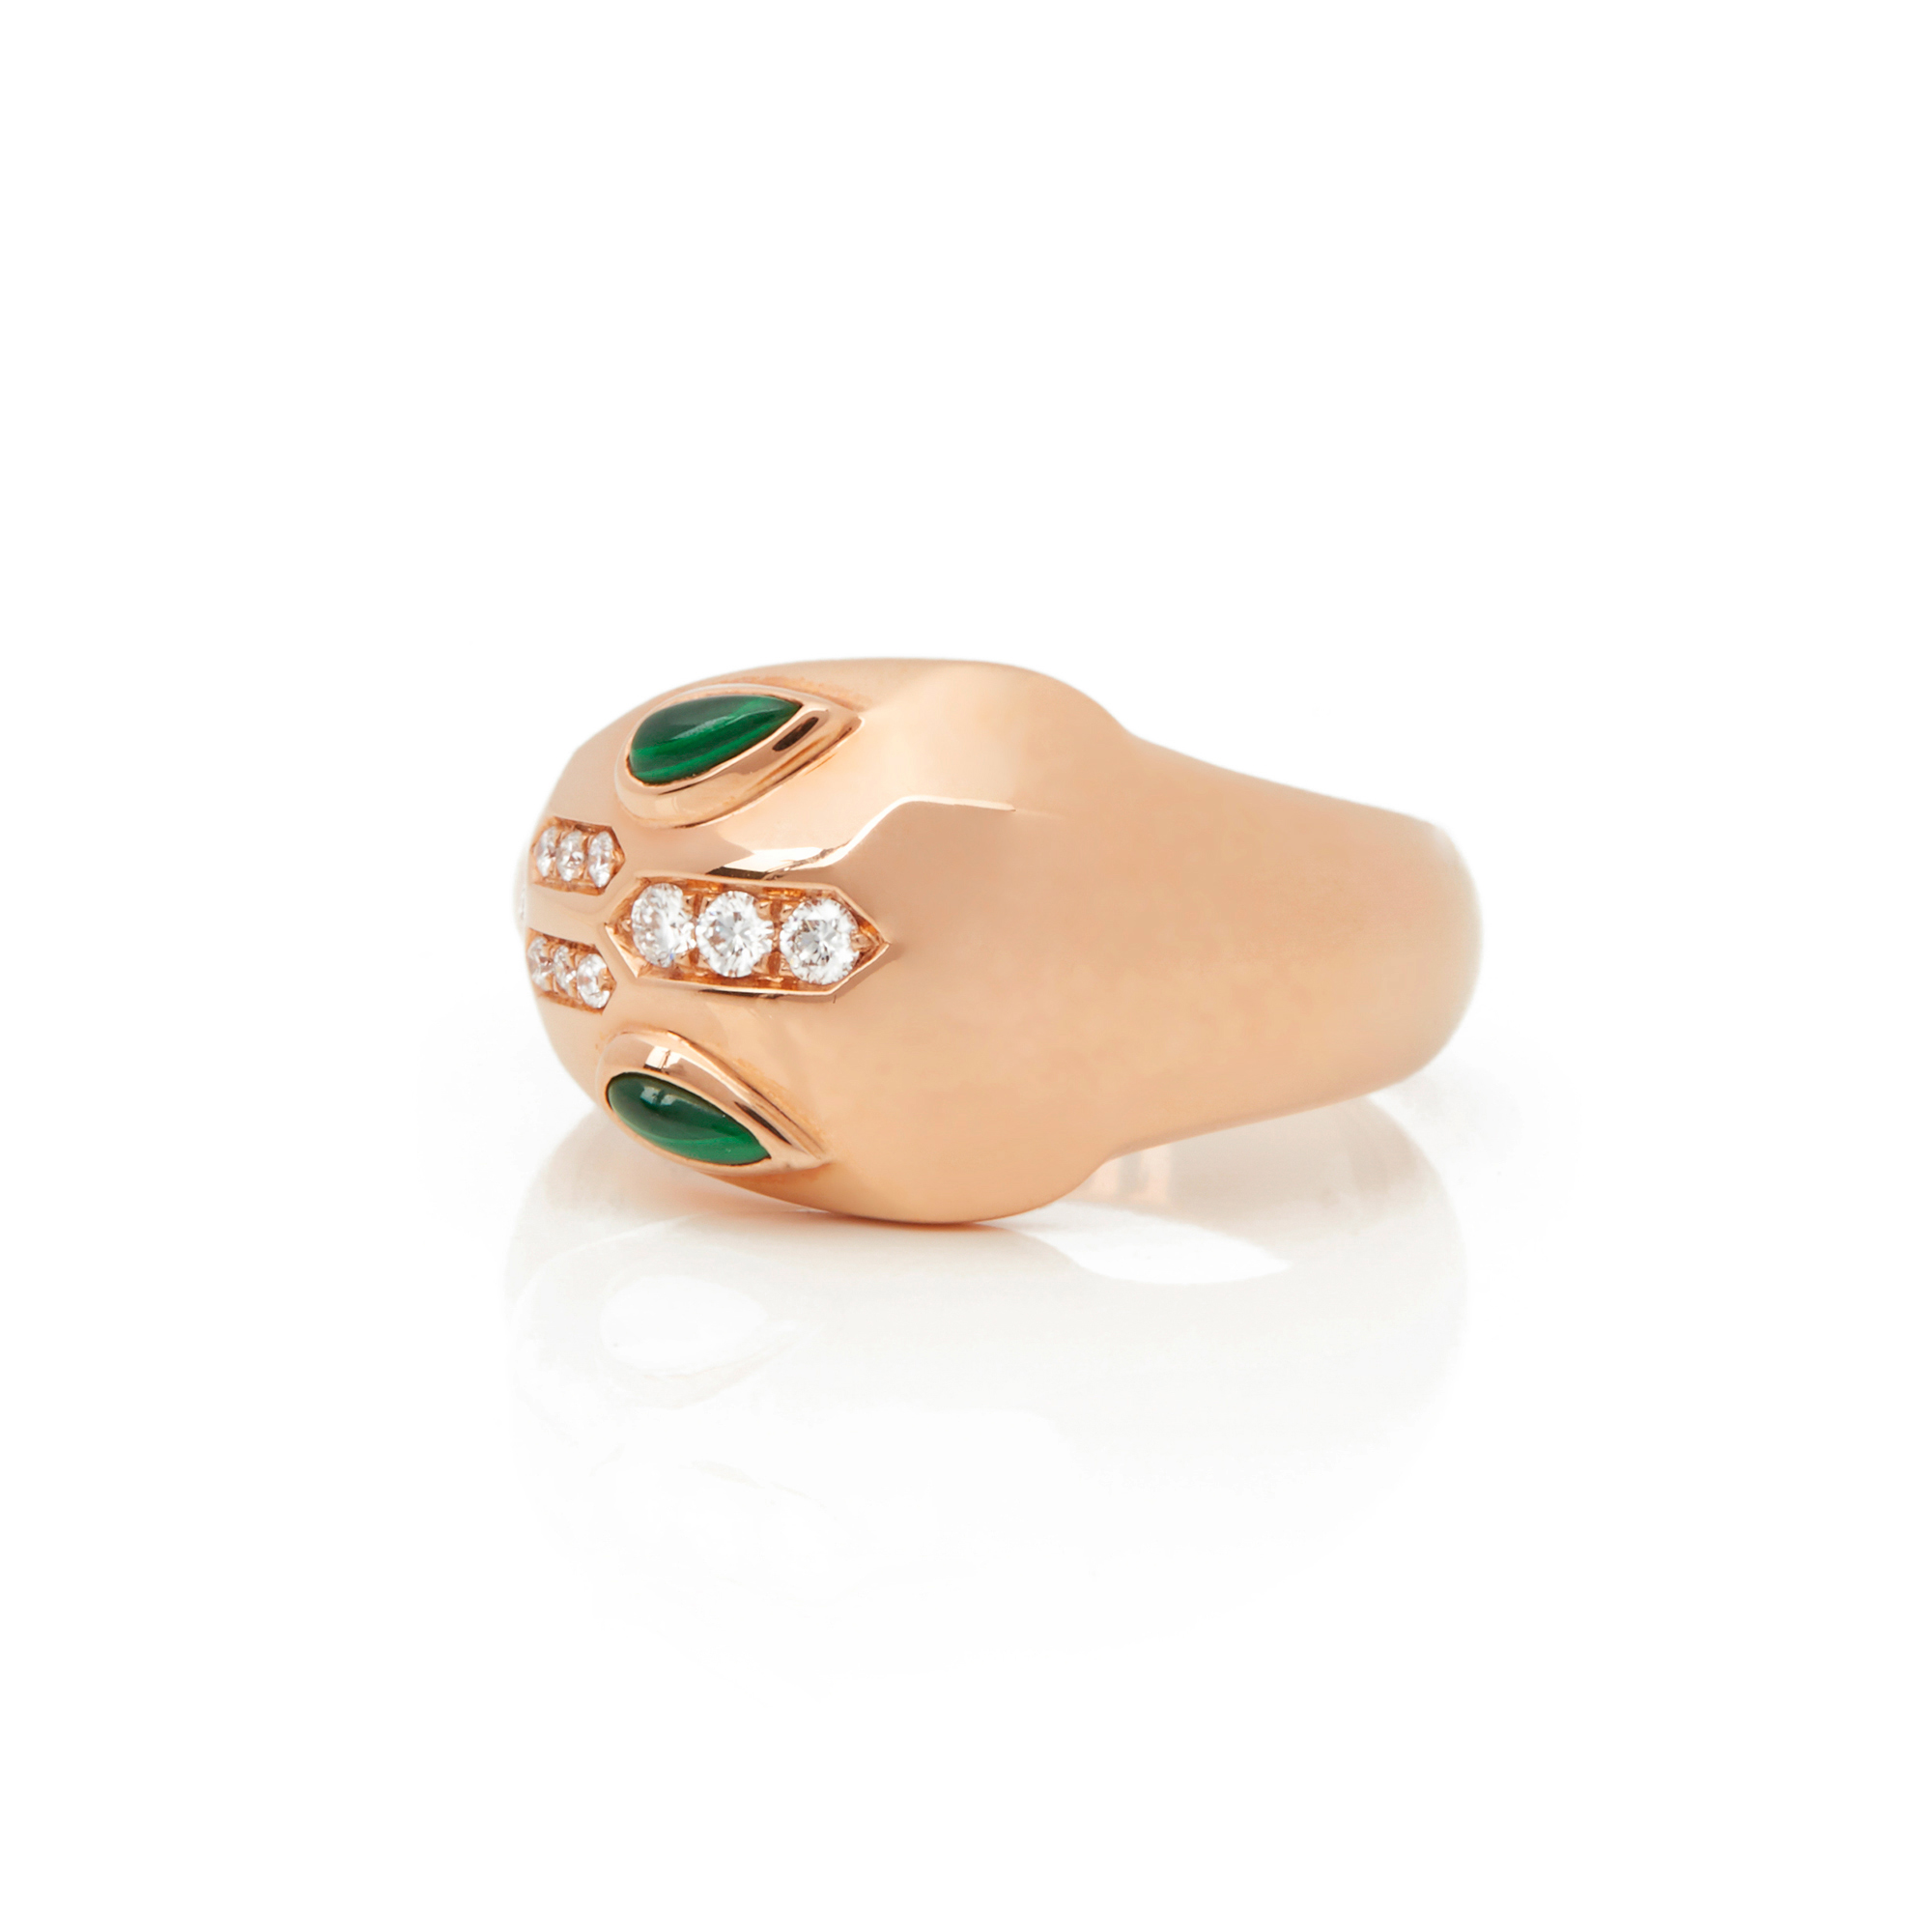 18k Rose Gold Diamond & Malachite Serpenti Ring - Image 10 of 10